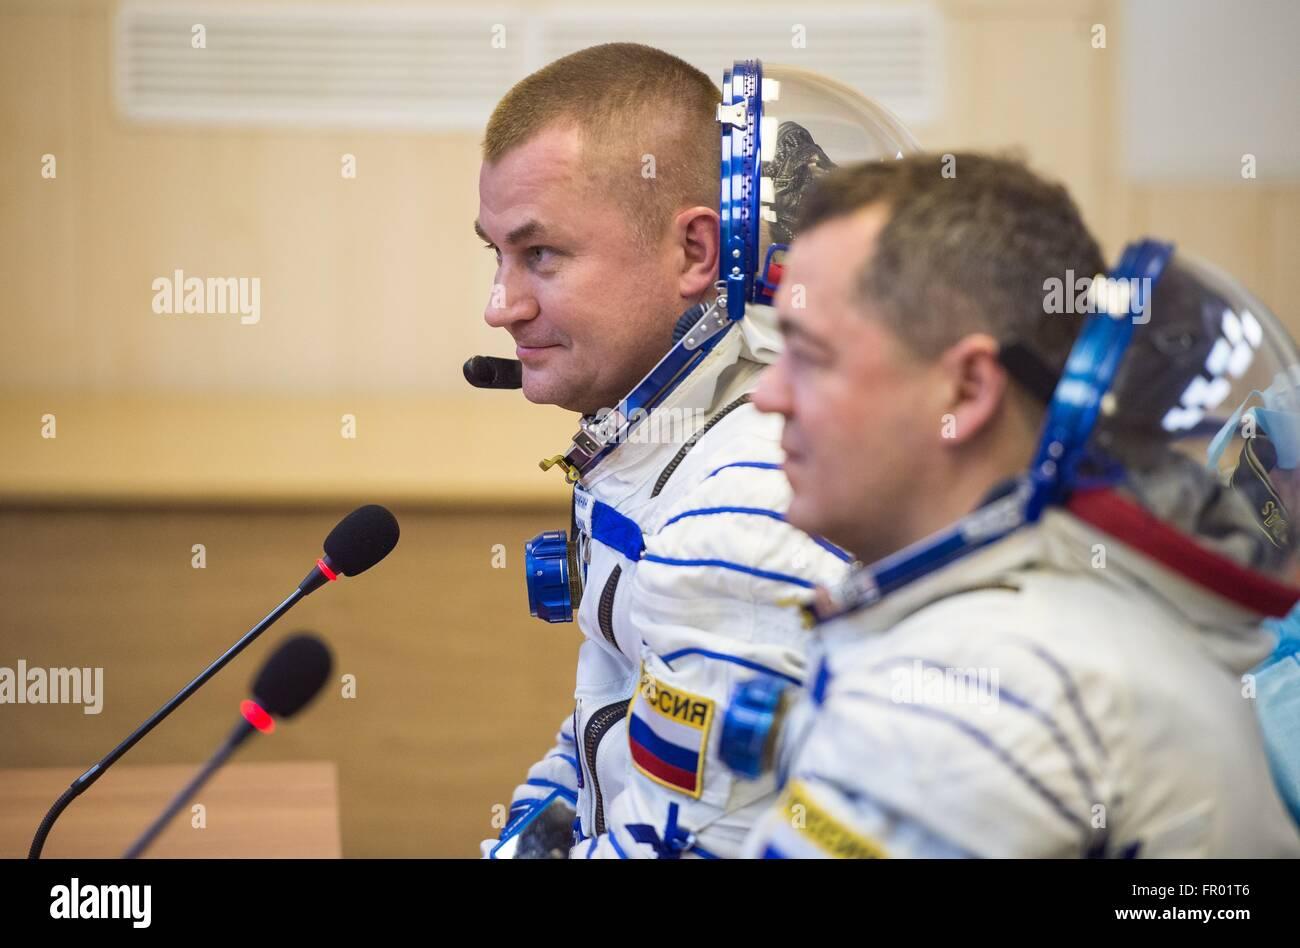 Baikonur, Kazakhstan. 19th Mar, 2016. Russian Soyuz Commander Alexey Ovchinin speaks with family after having his - Stock Image